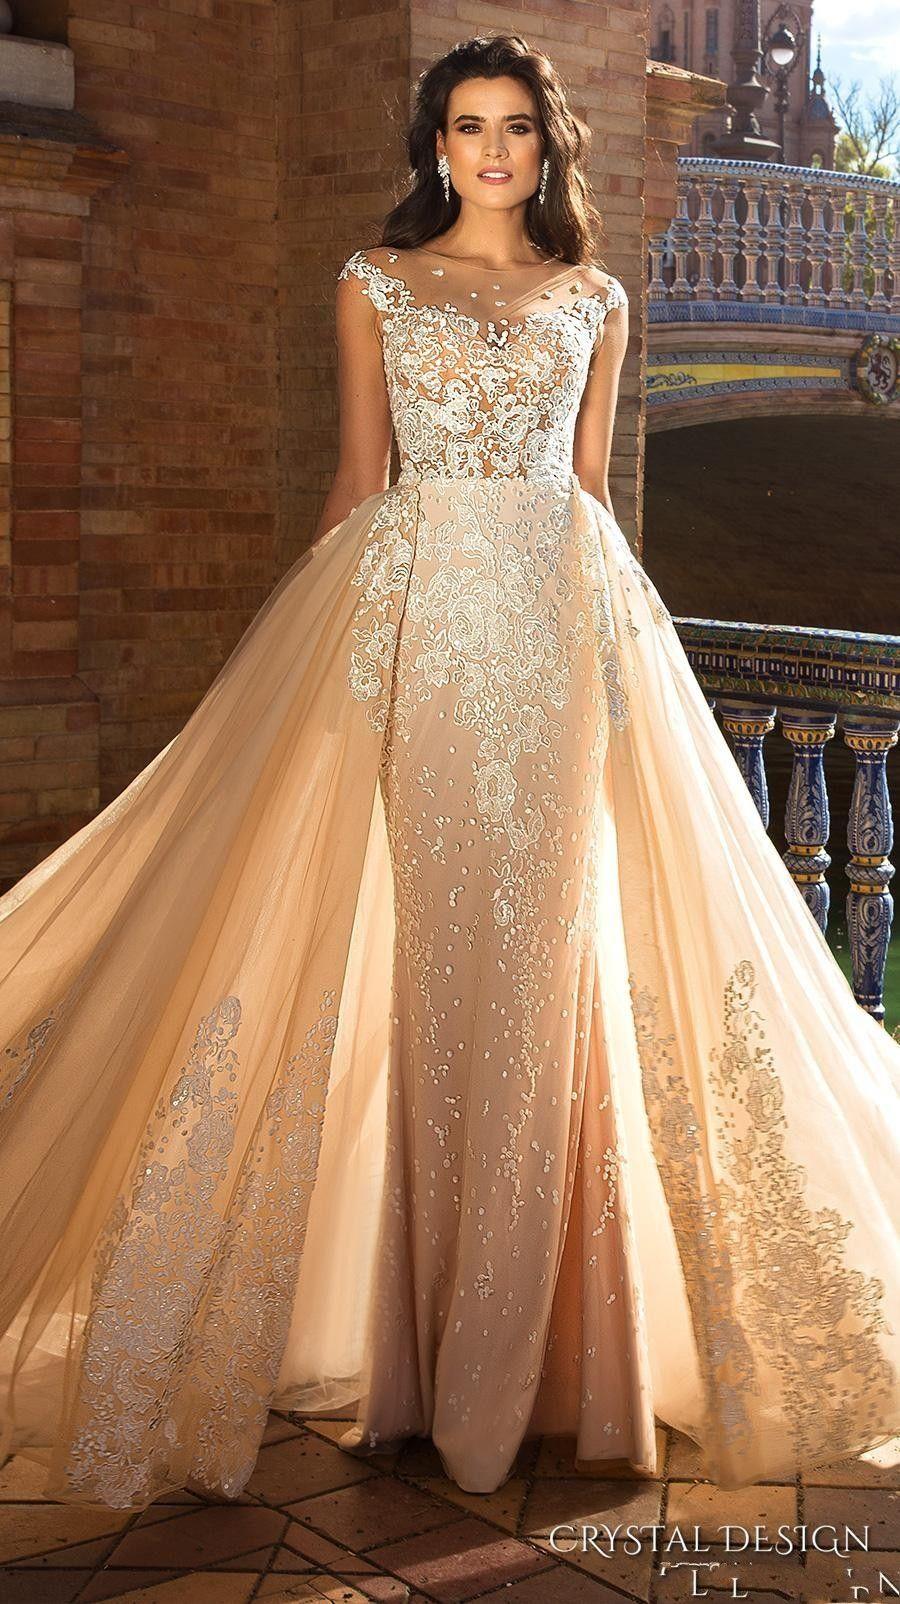 Crystal Design 2018 Bridal Capped Sleeve Jewel Neck Heavily Embroidered Bodice Detachable Skirt Sheath Wedding Dresses Low Back Long Train